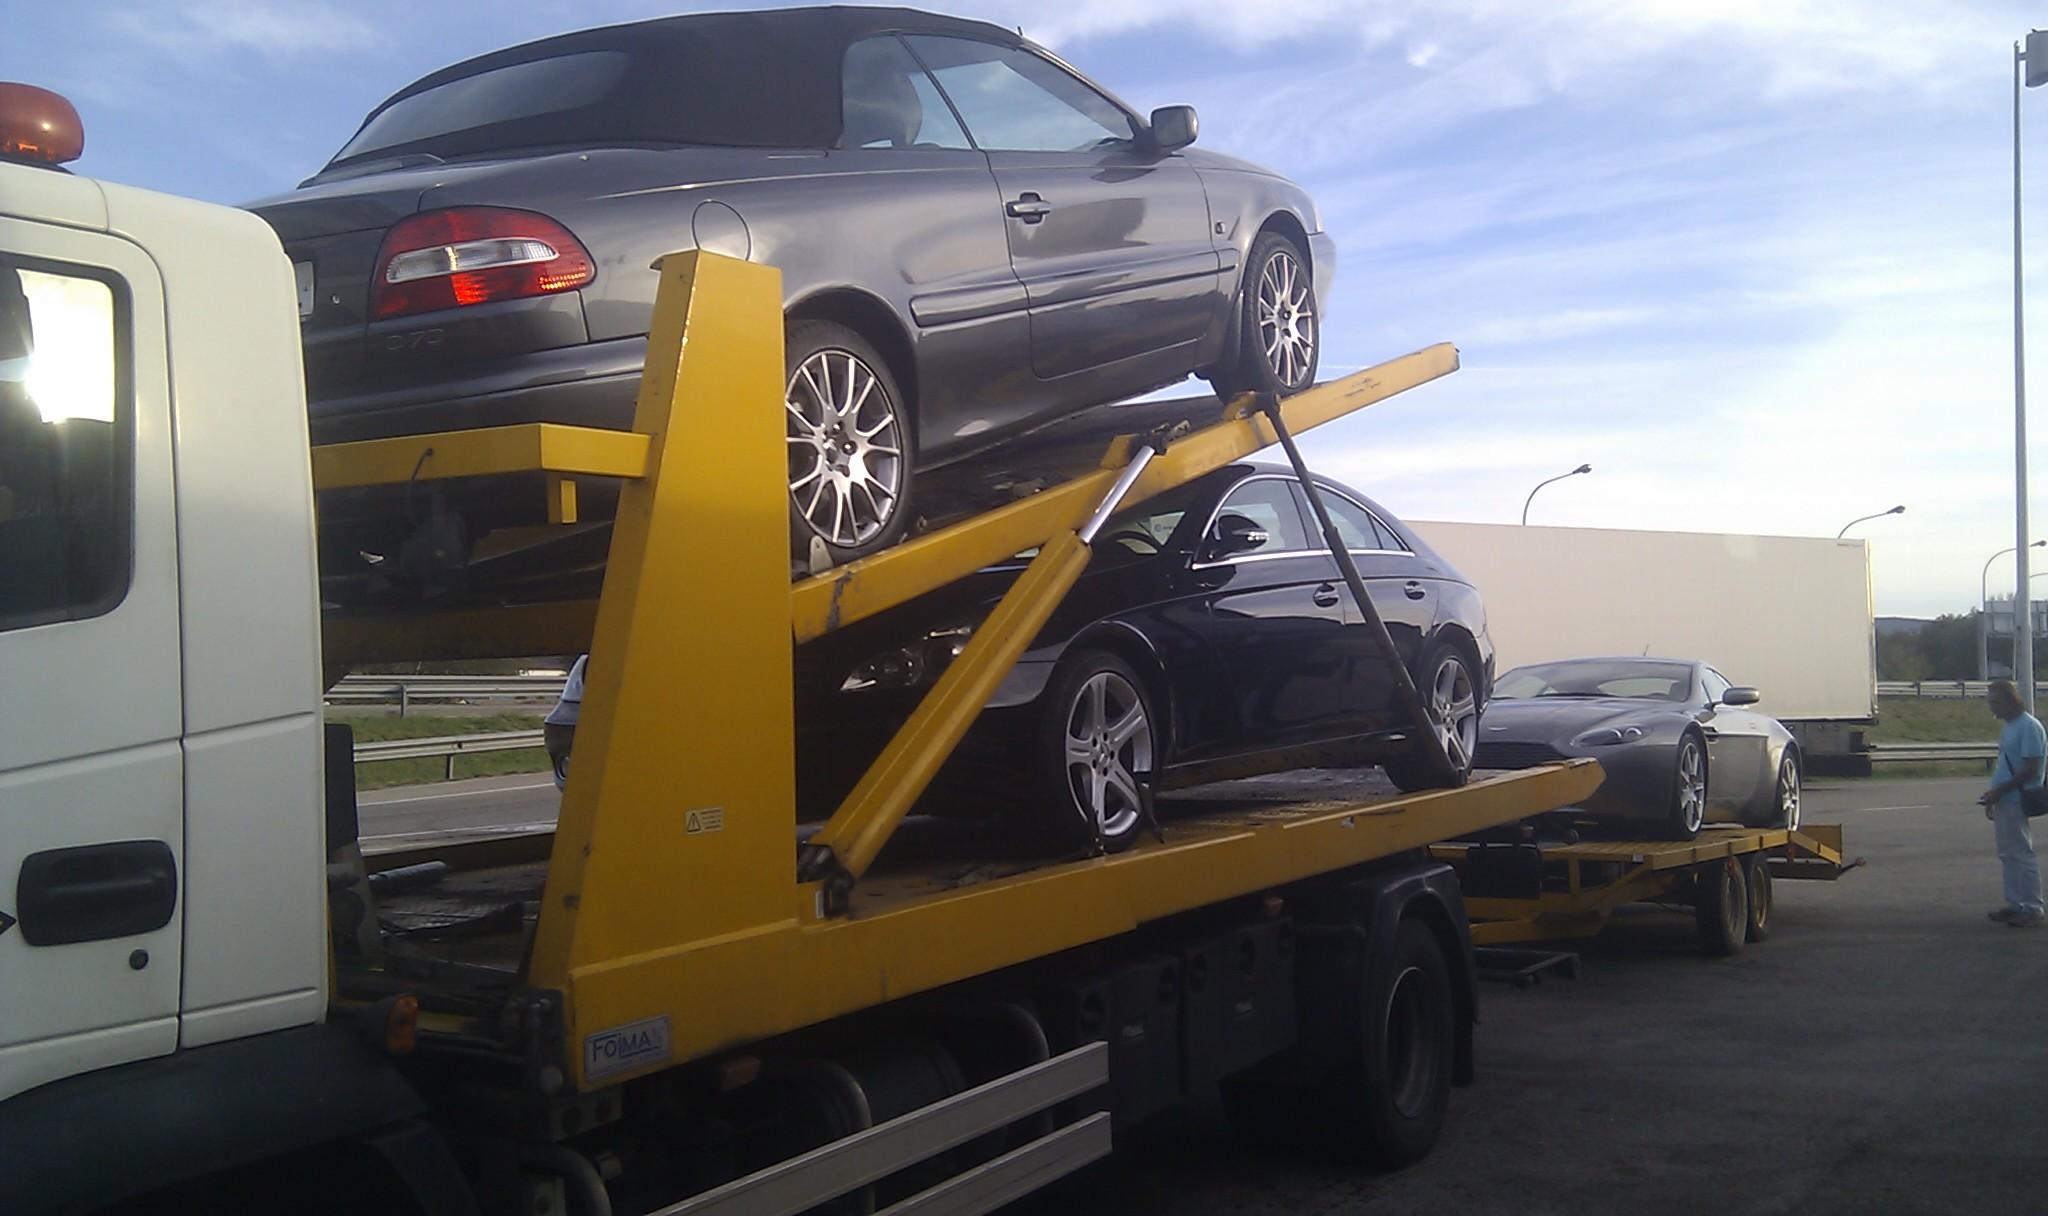 Mindscape alquiler vehiculos peliculas tyreaction jordi nebot 16